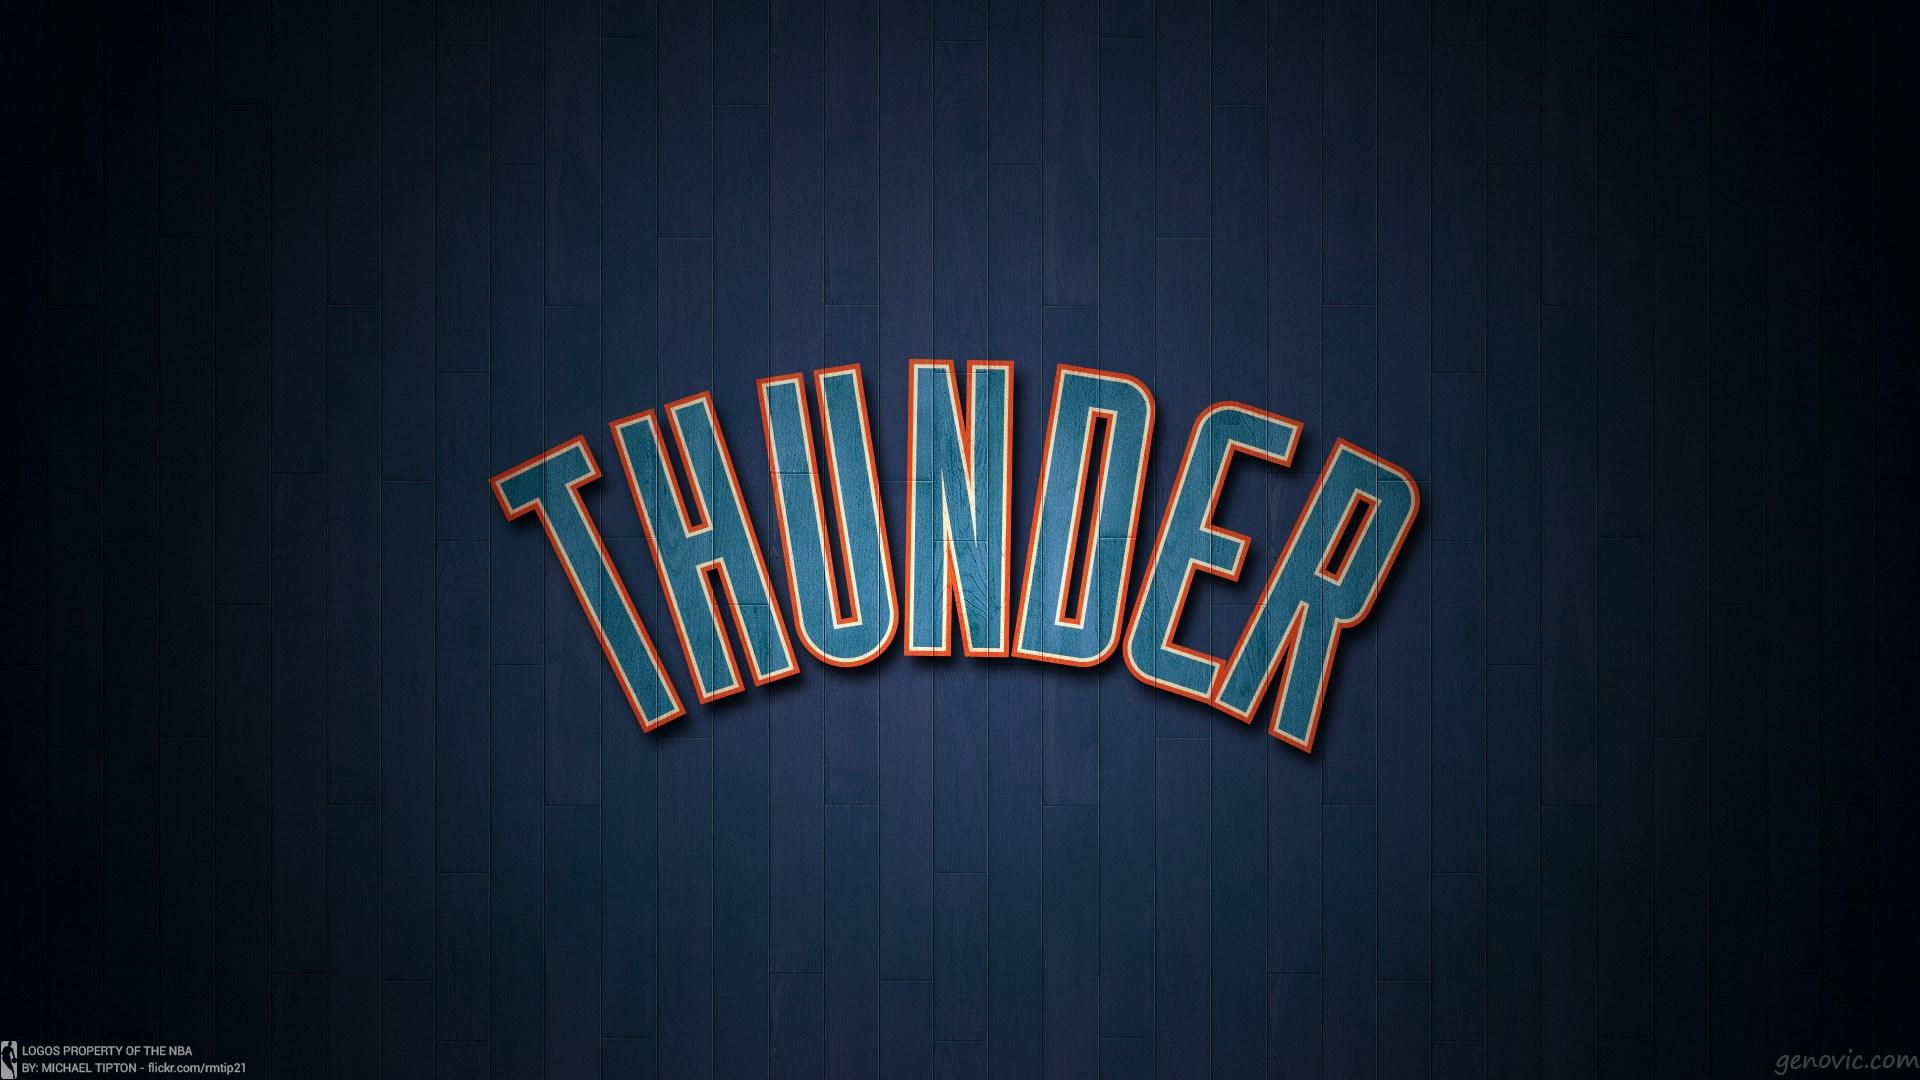 Oklahoma City Thunder Wallpaper HDjpg 1920x1080